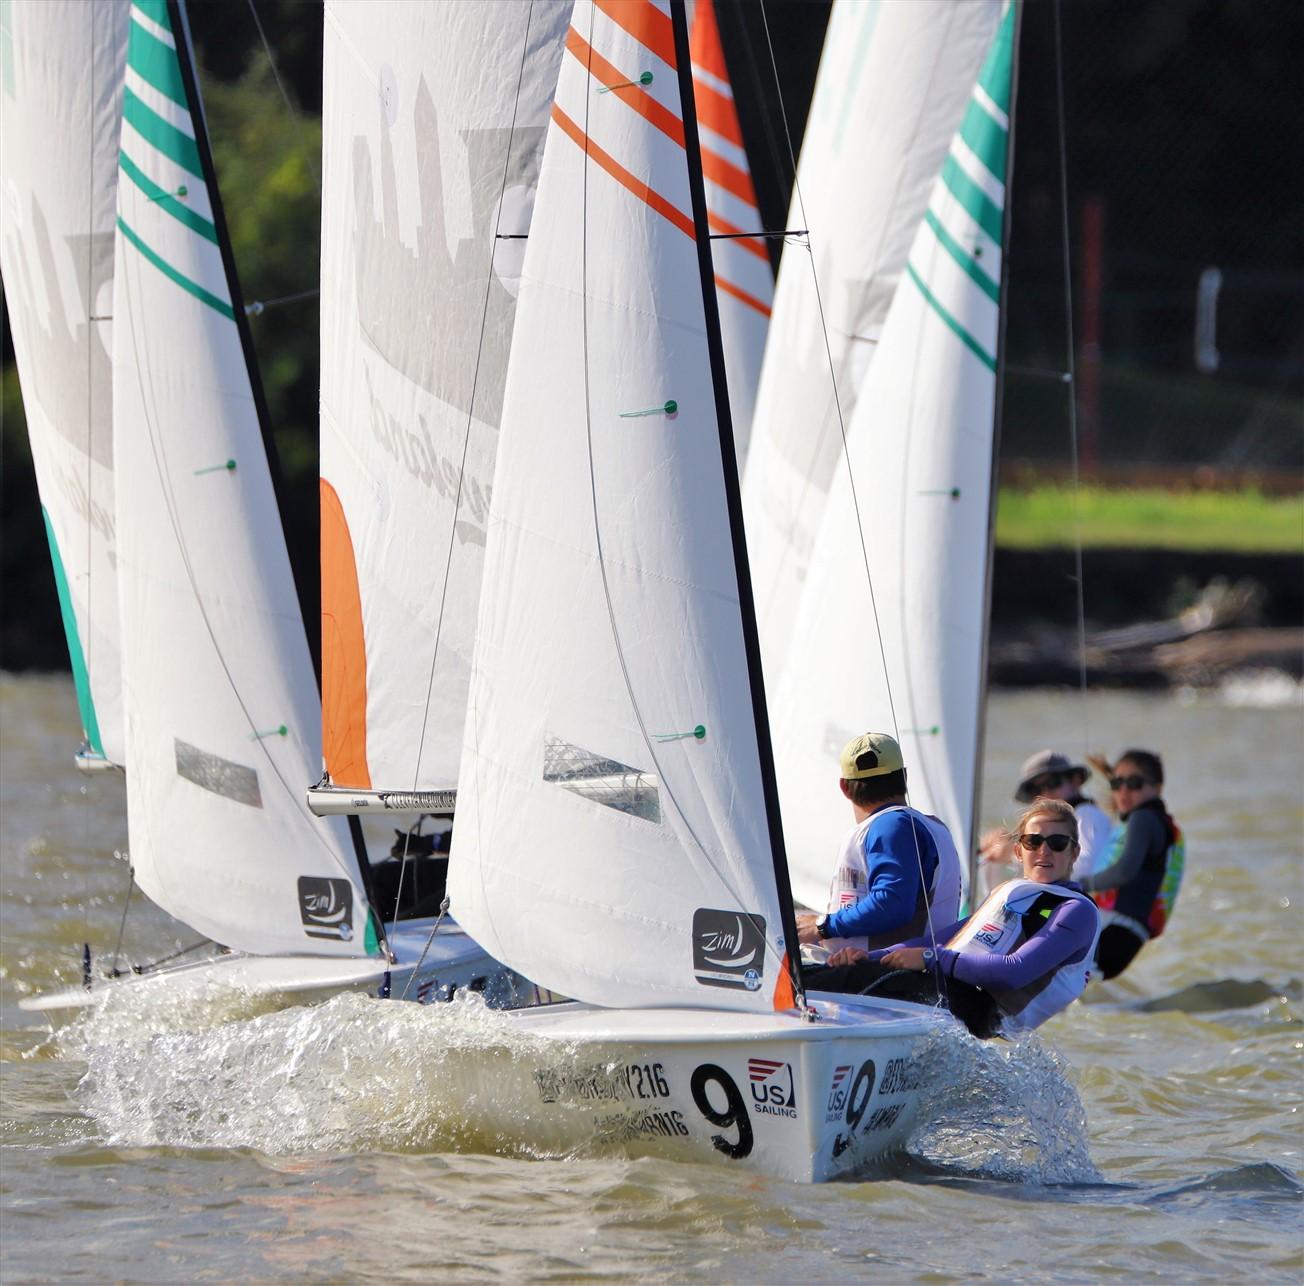 2018 09 29 15 Cleveland US Sailing Championships.jpg